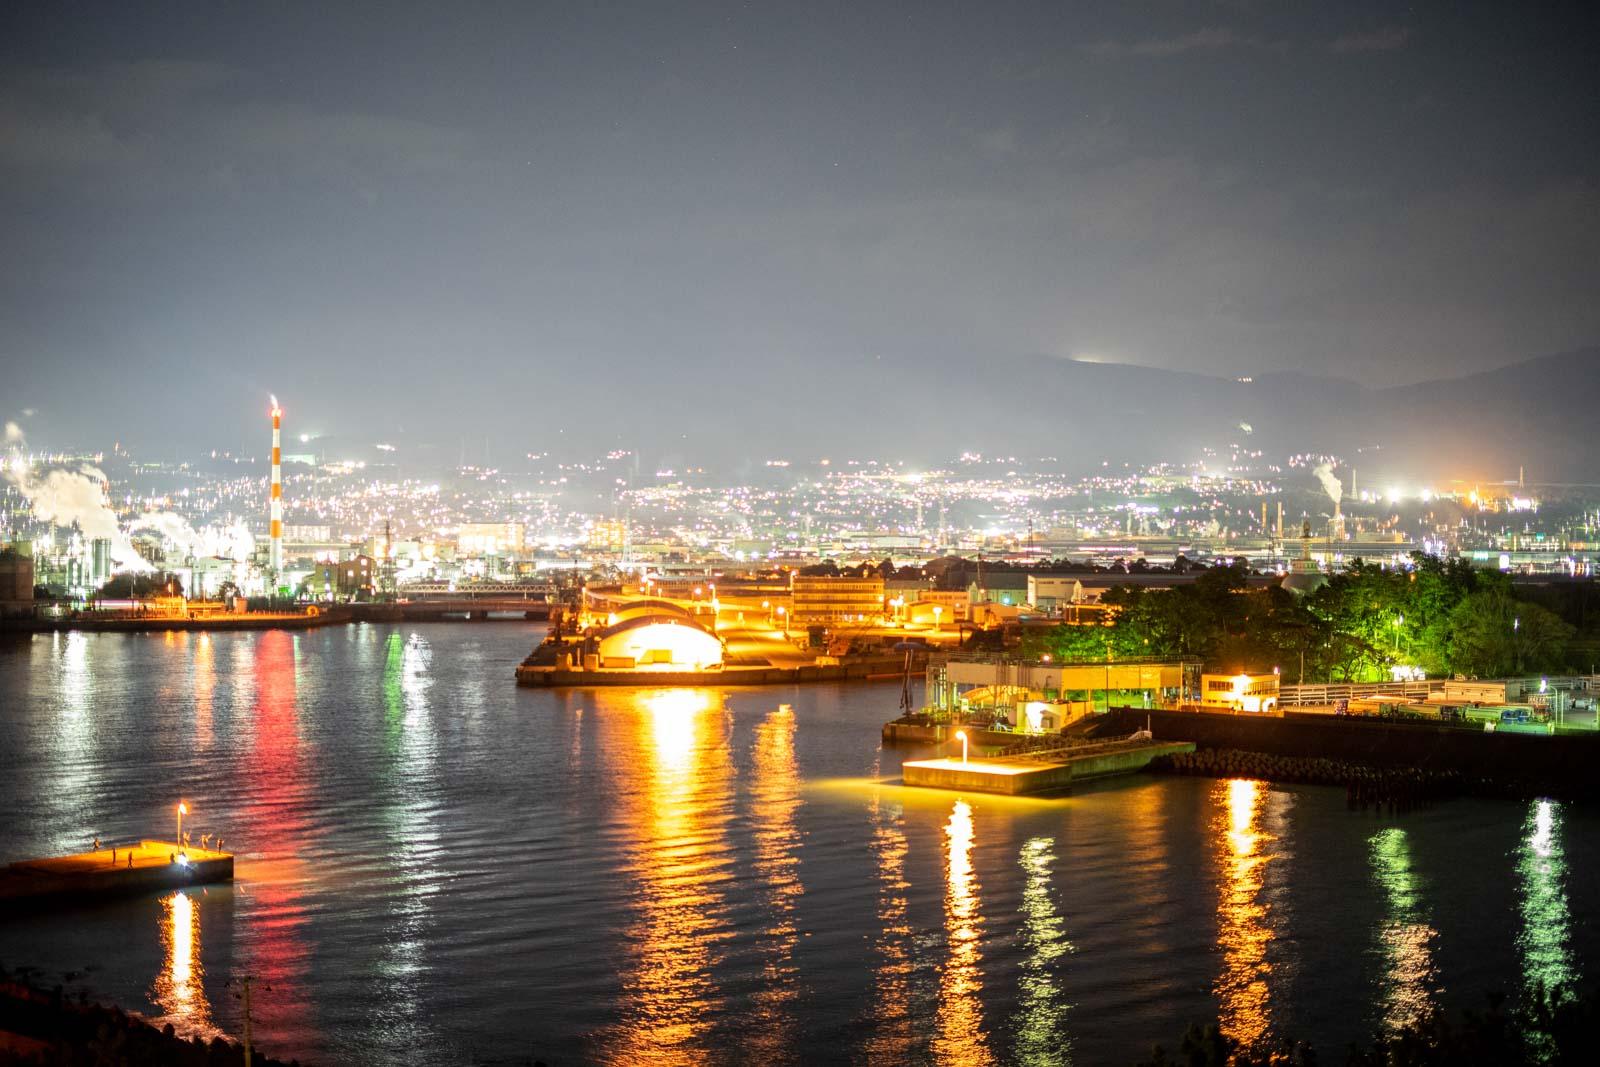 Mt Fuji Factory viewpoint